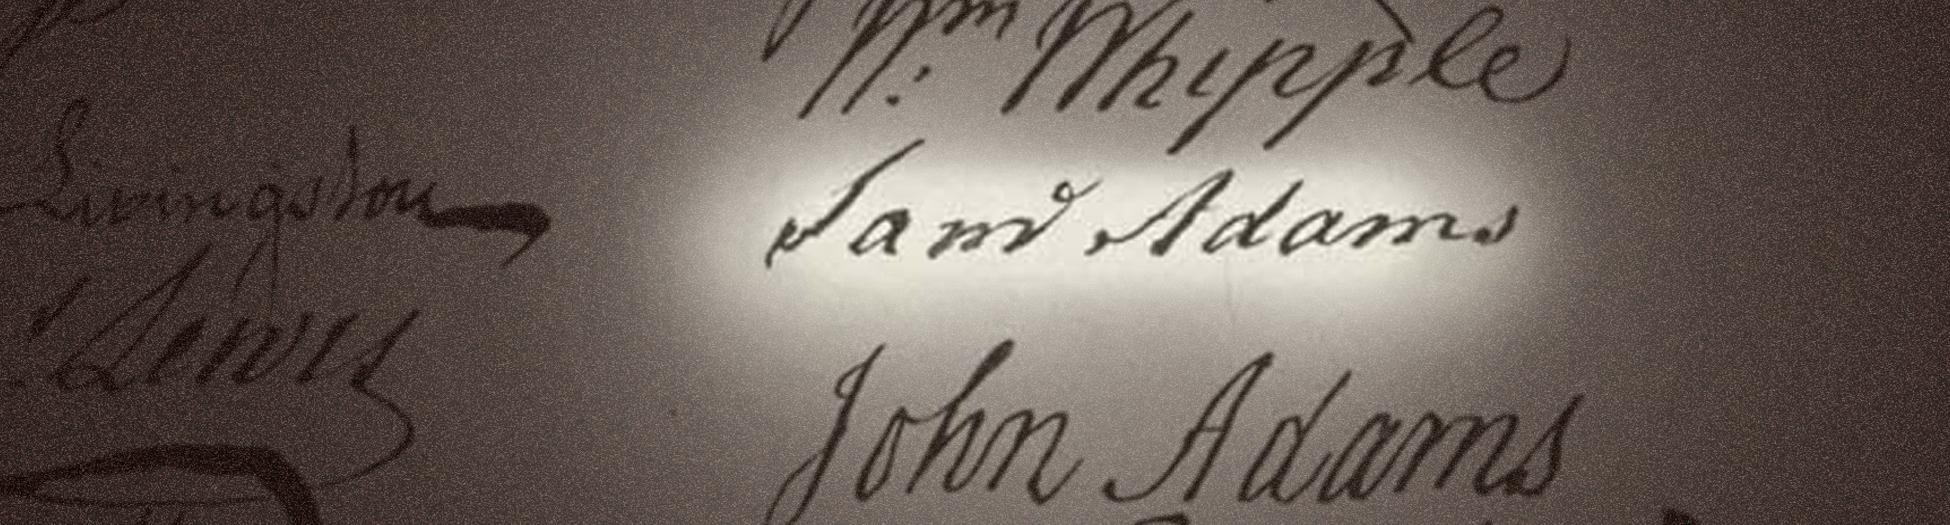 Liberty | Knowledge Speaks  |Declaration Of Independence Signatures John Adams